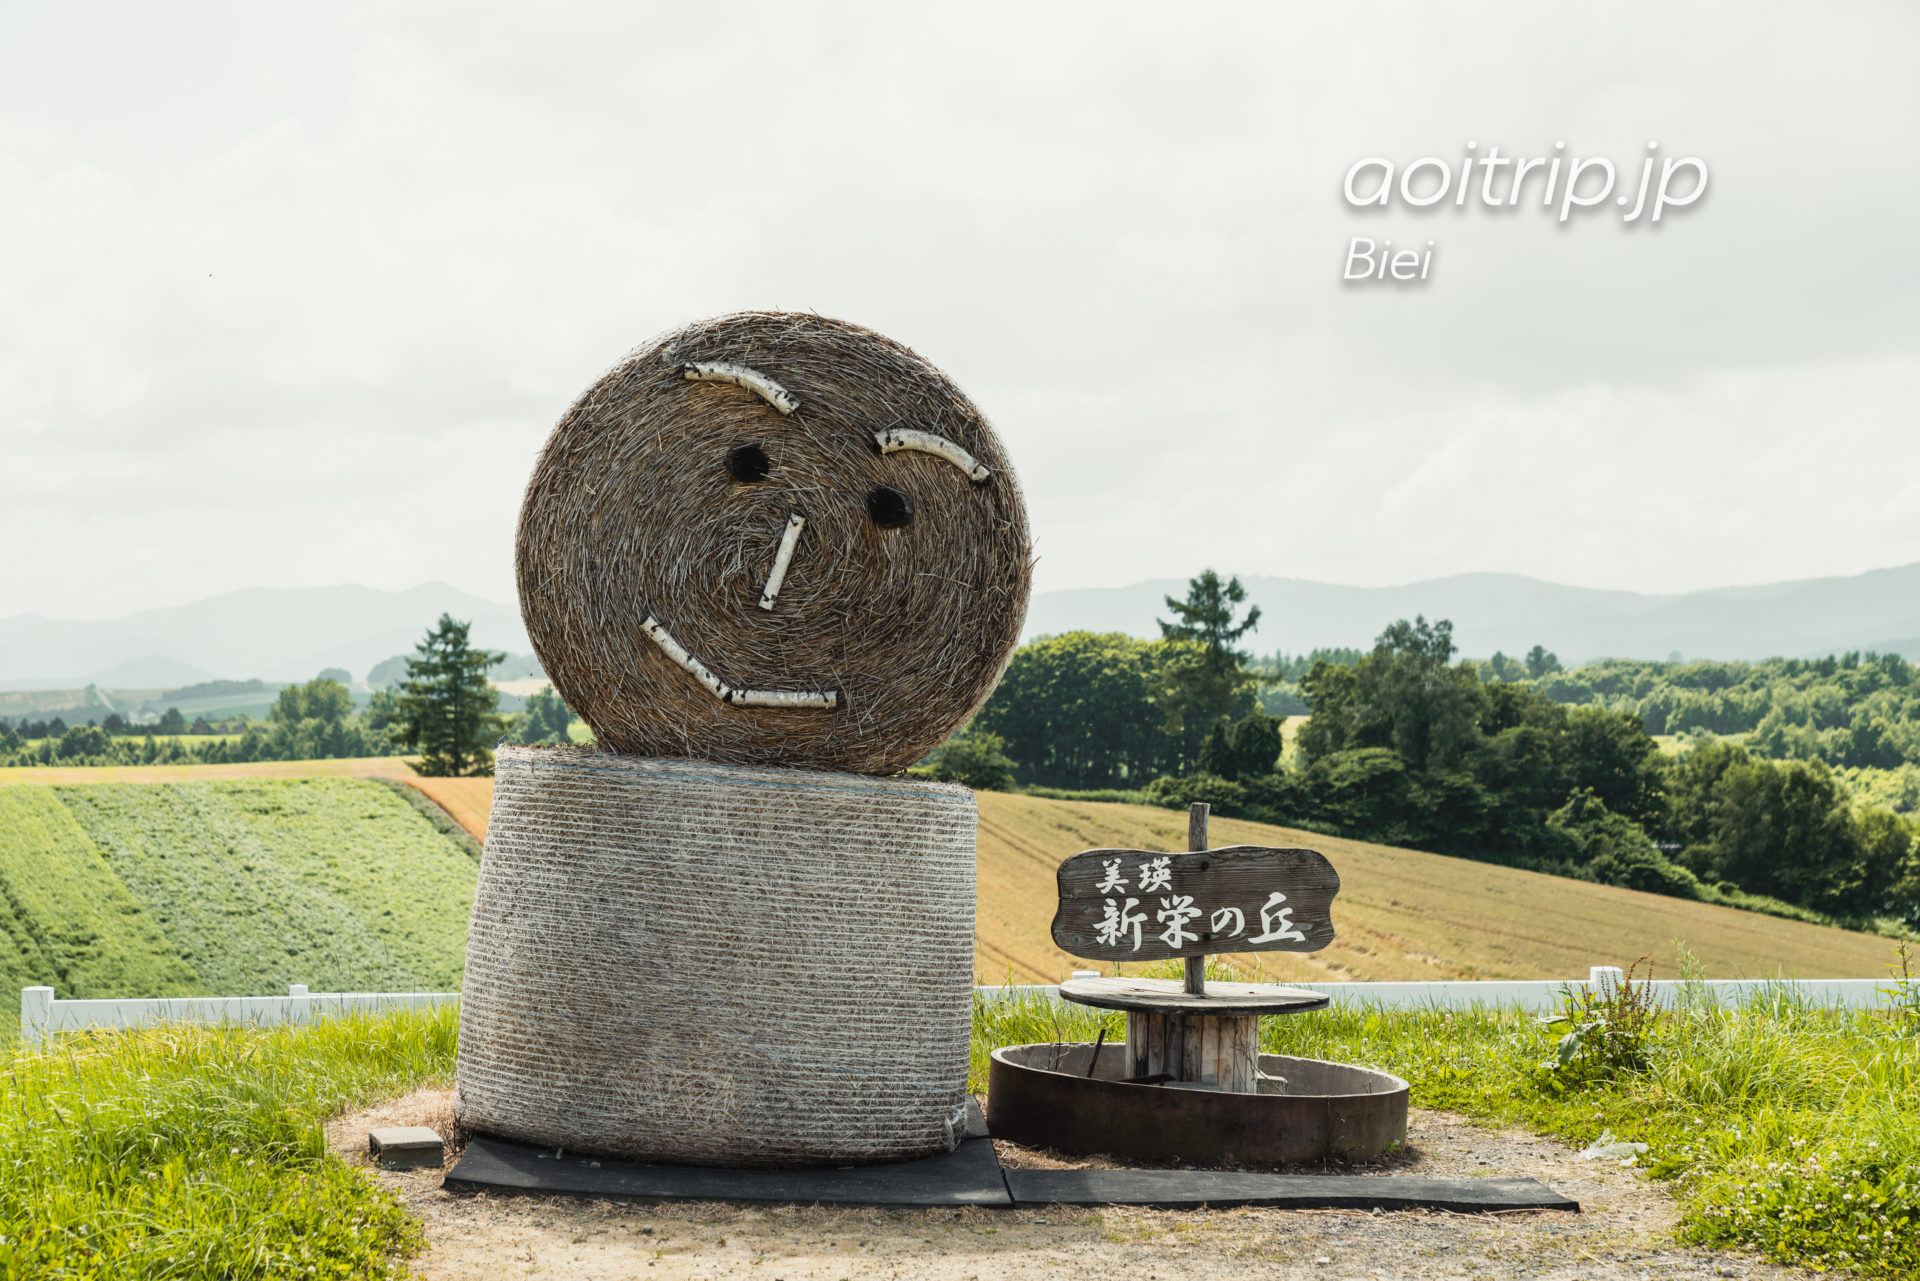 美瑛 新栄の丘展望公園|Shinei no Oka, Biei